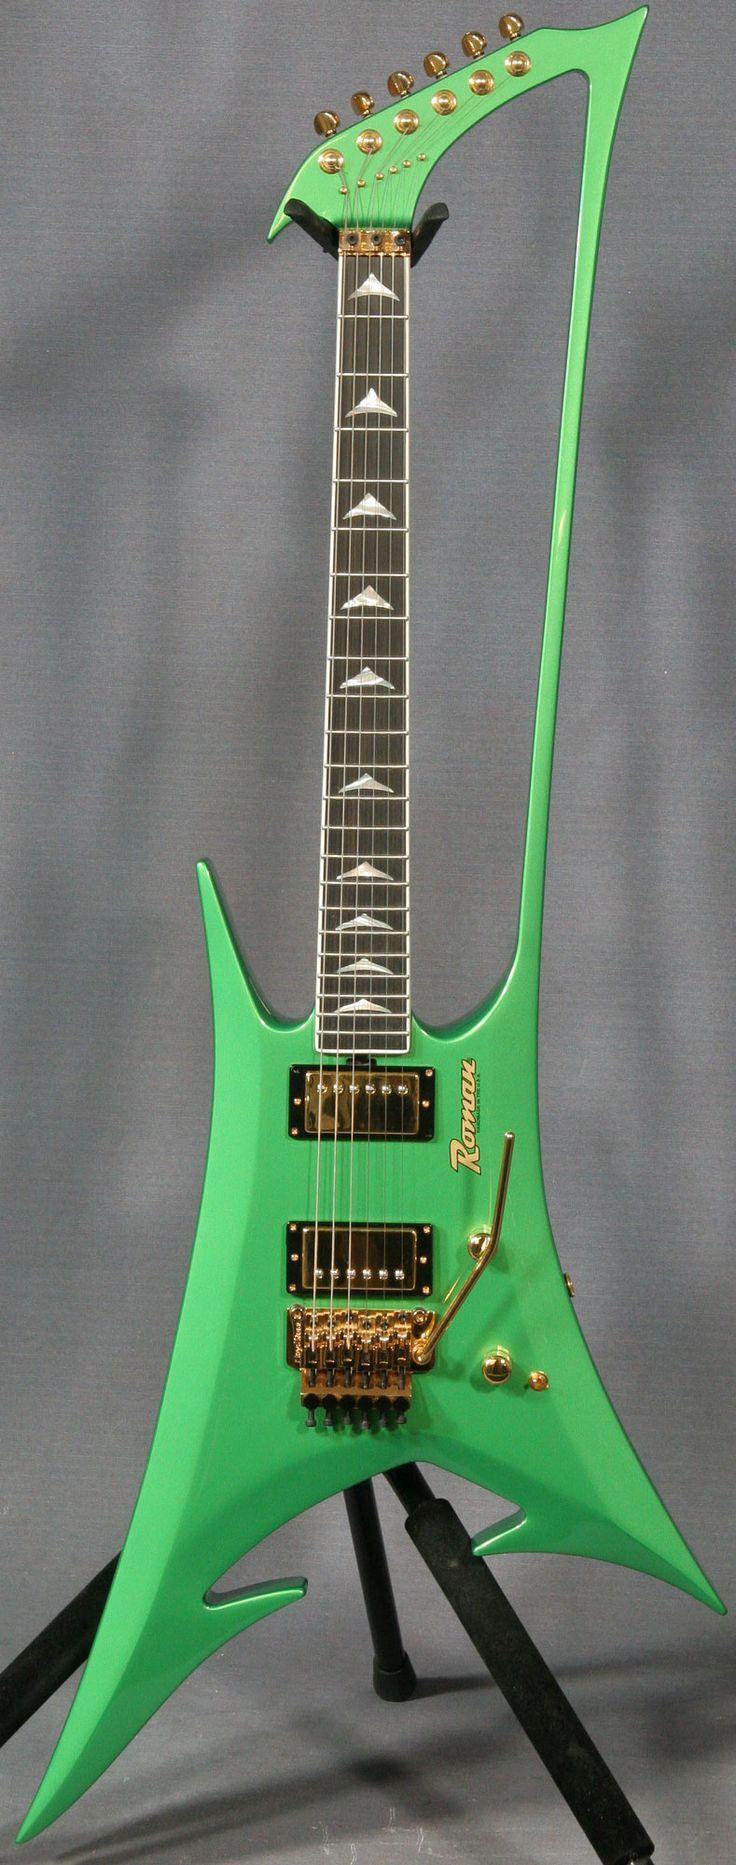 guitars for sale | Abstract Enterprize Guitar - Ed Roman Guitars